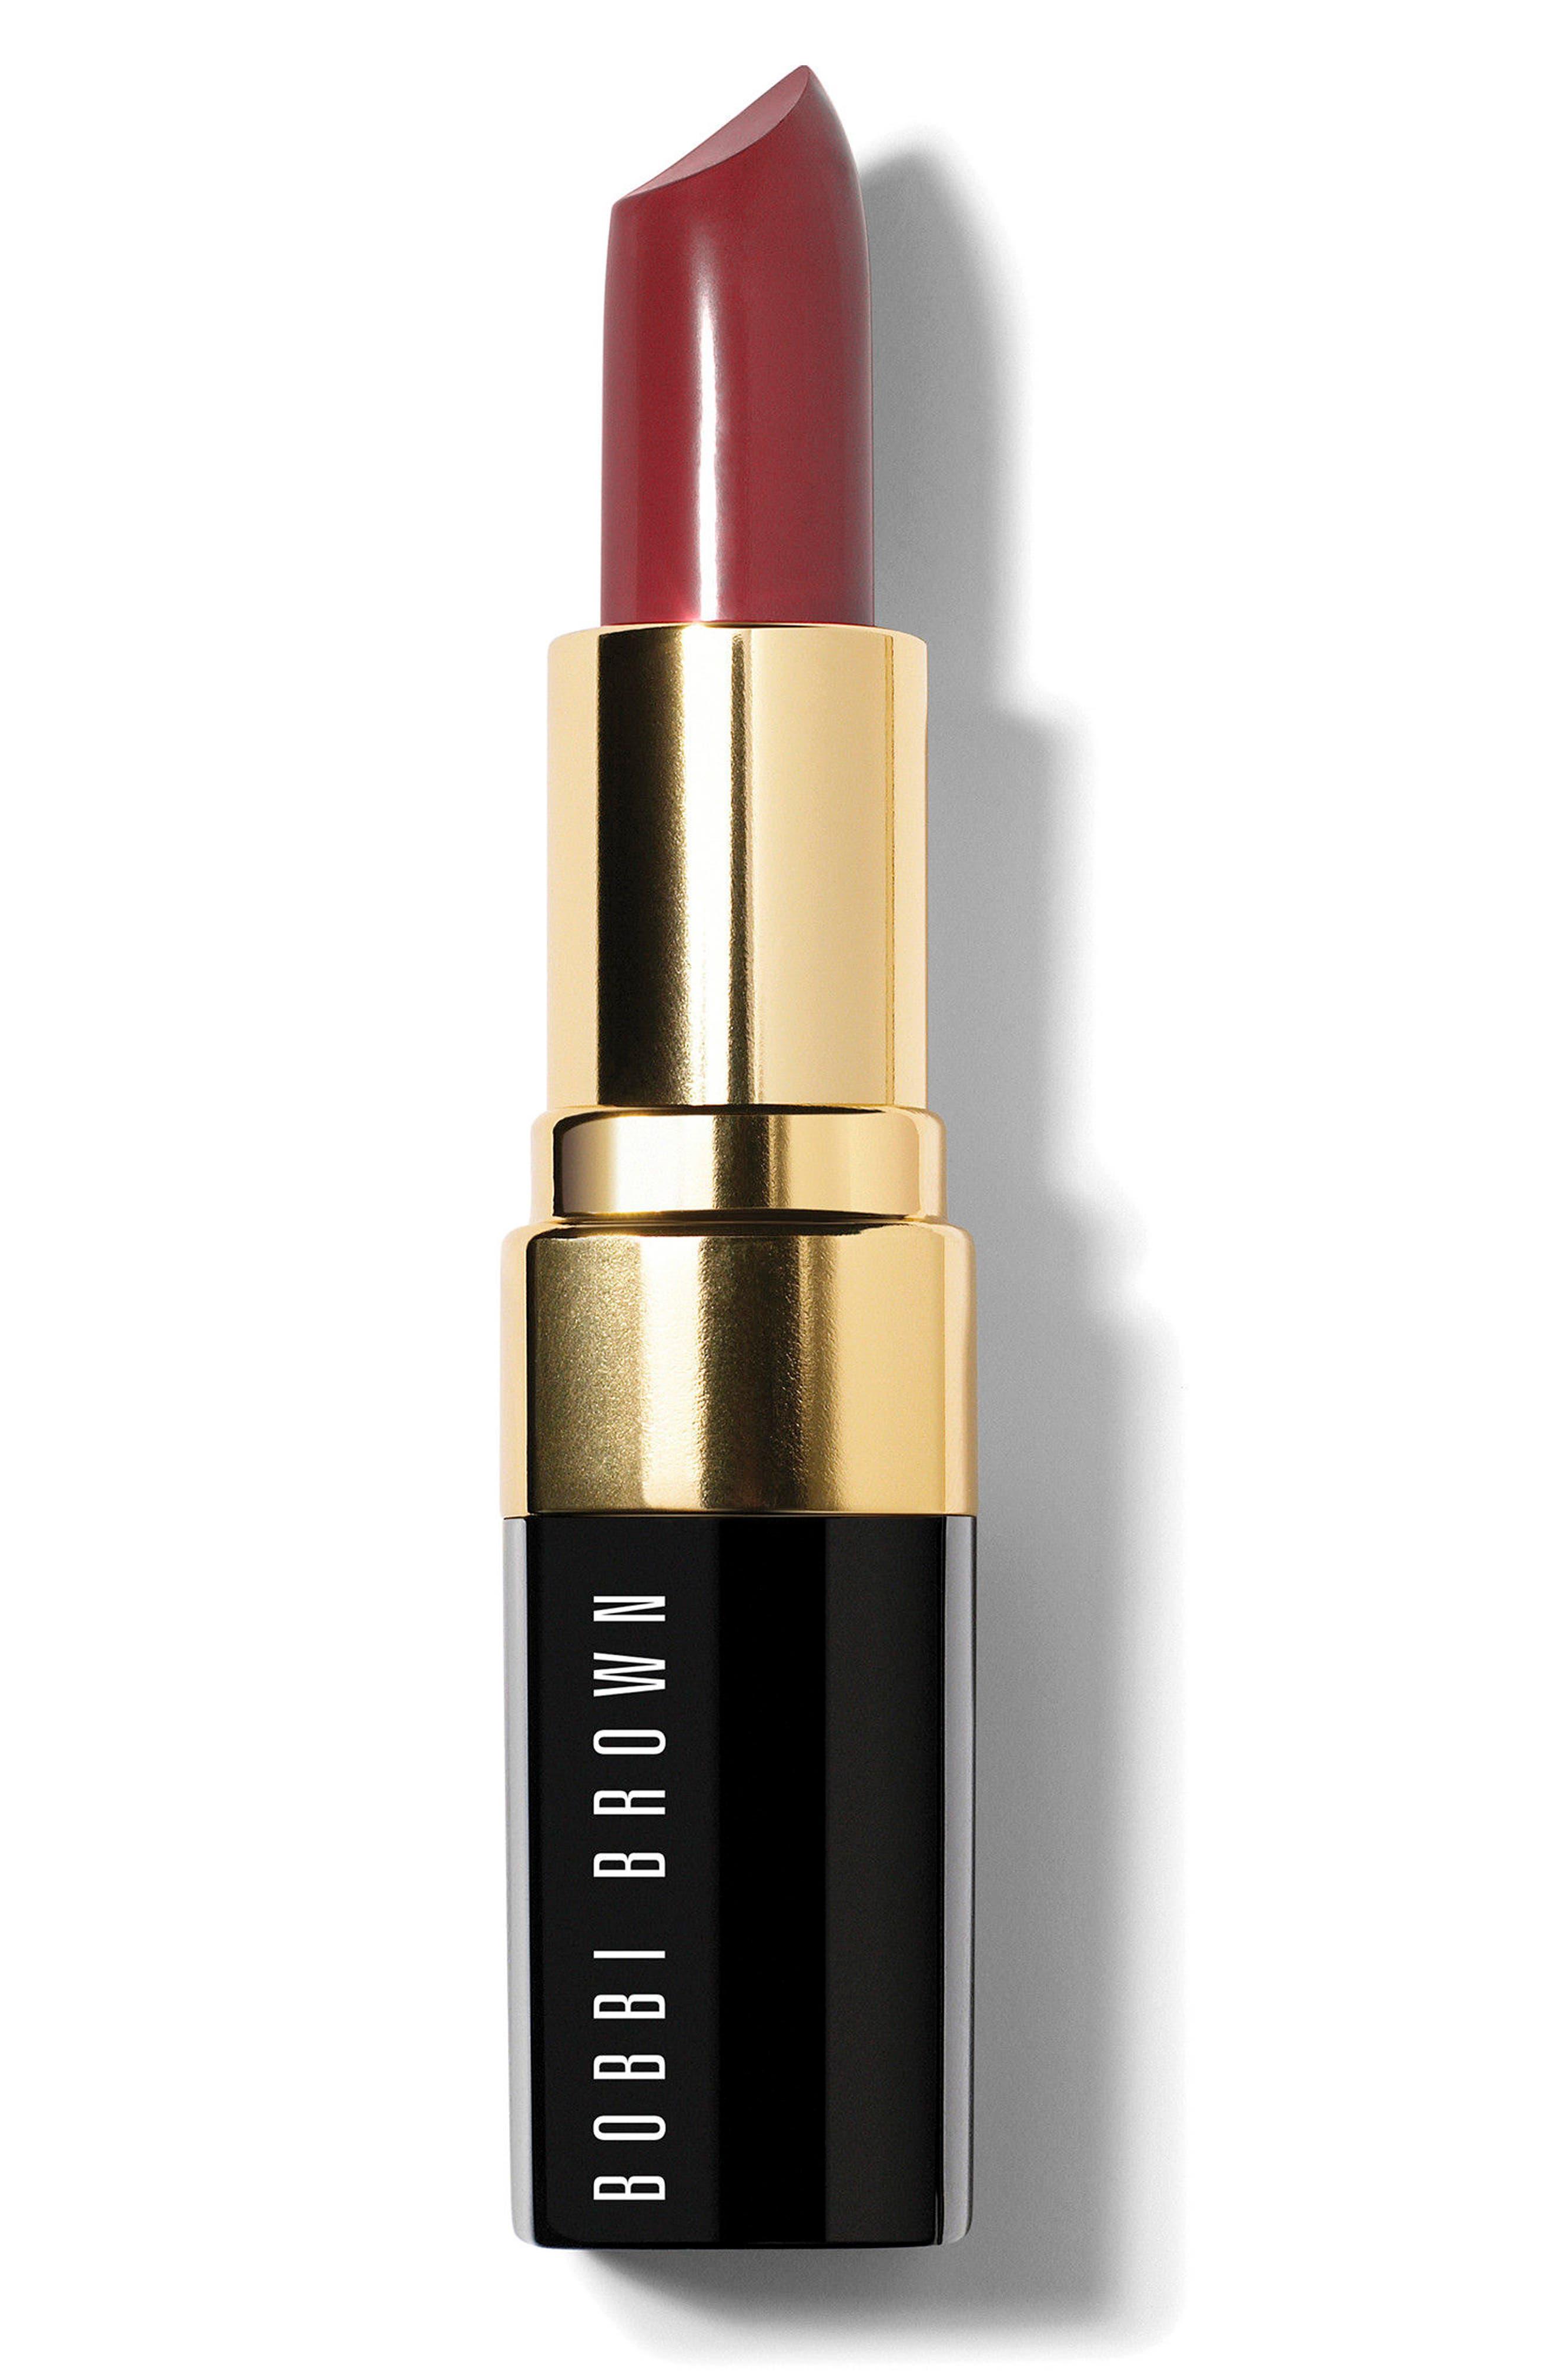 Bobbi Brown Wedding Shop Nordstrom Jill Beauty Lip Matte 13 Purplish Plum